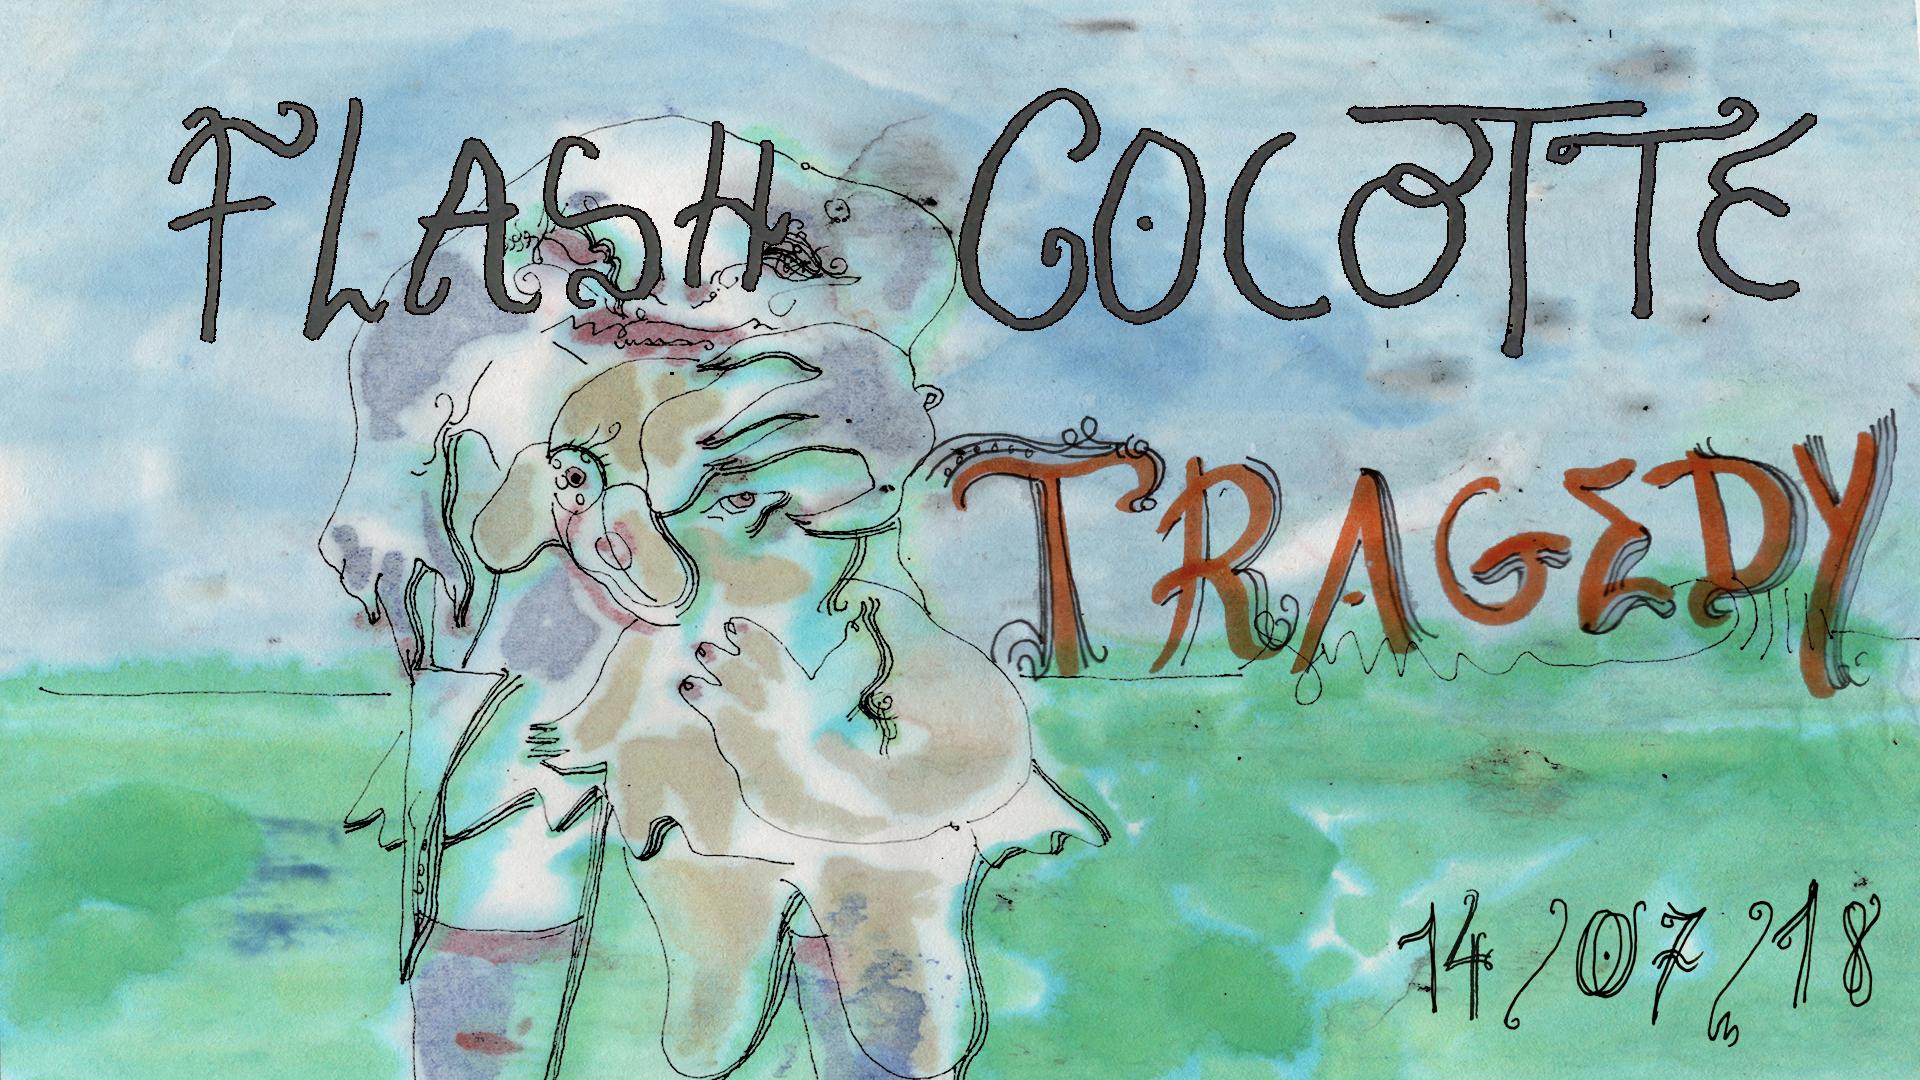 Flash Cocotte X Tragedy